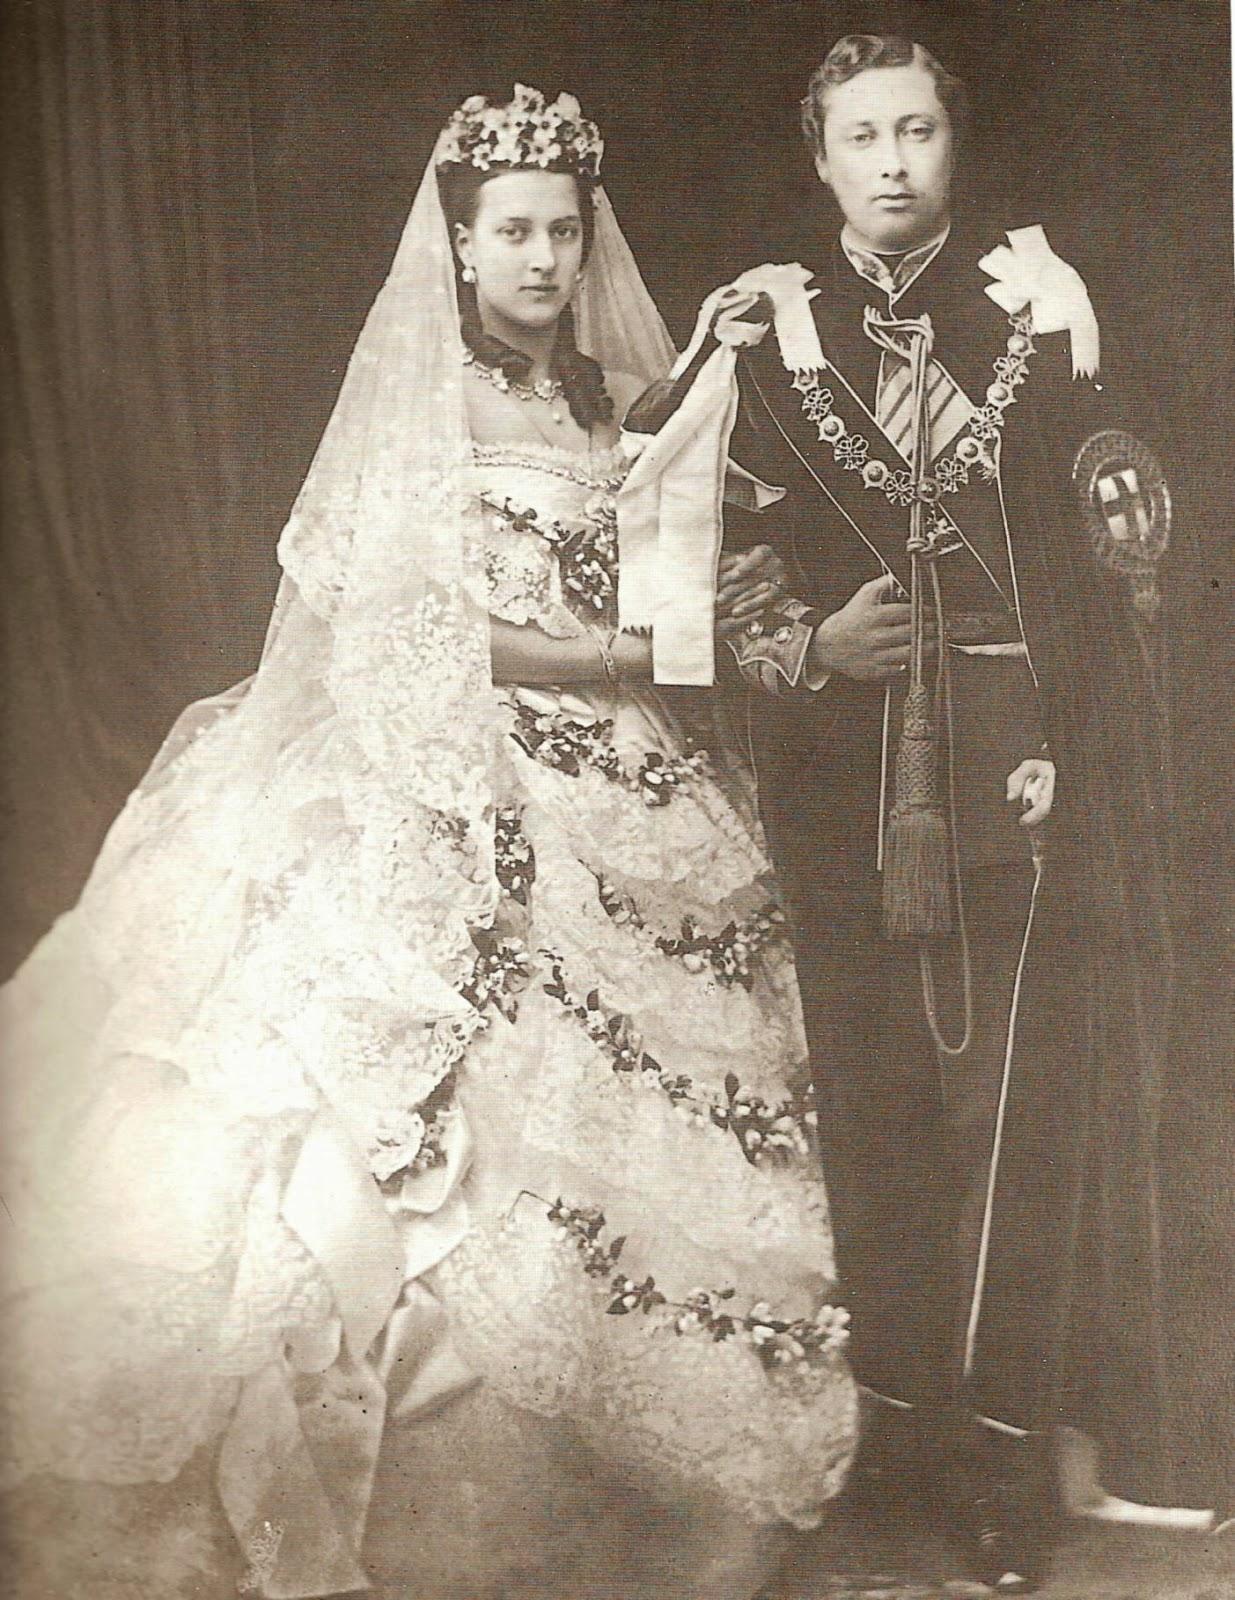 Alexandra of Denmark marries edward